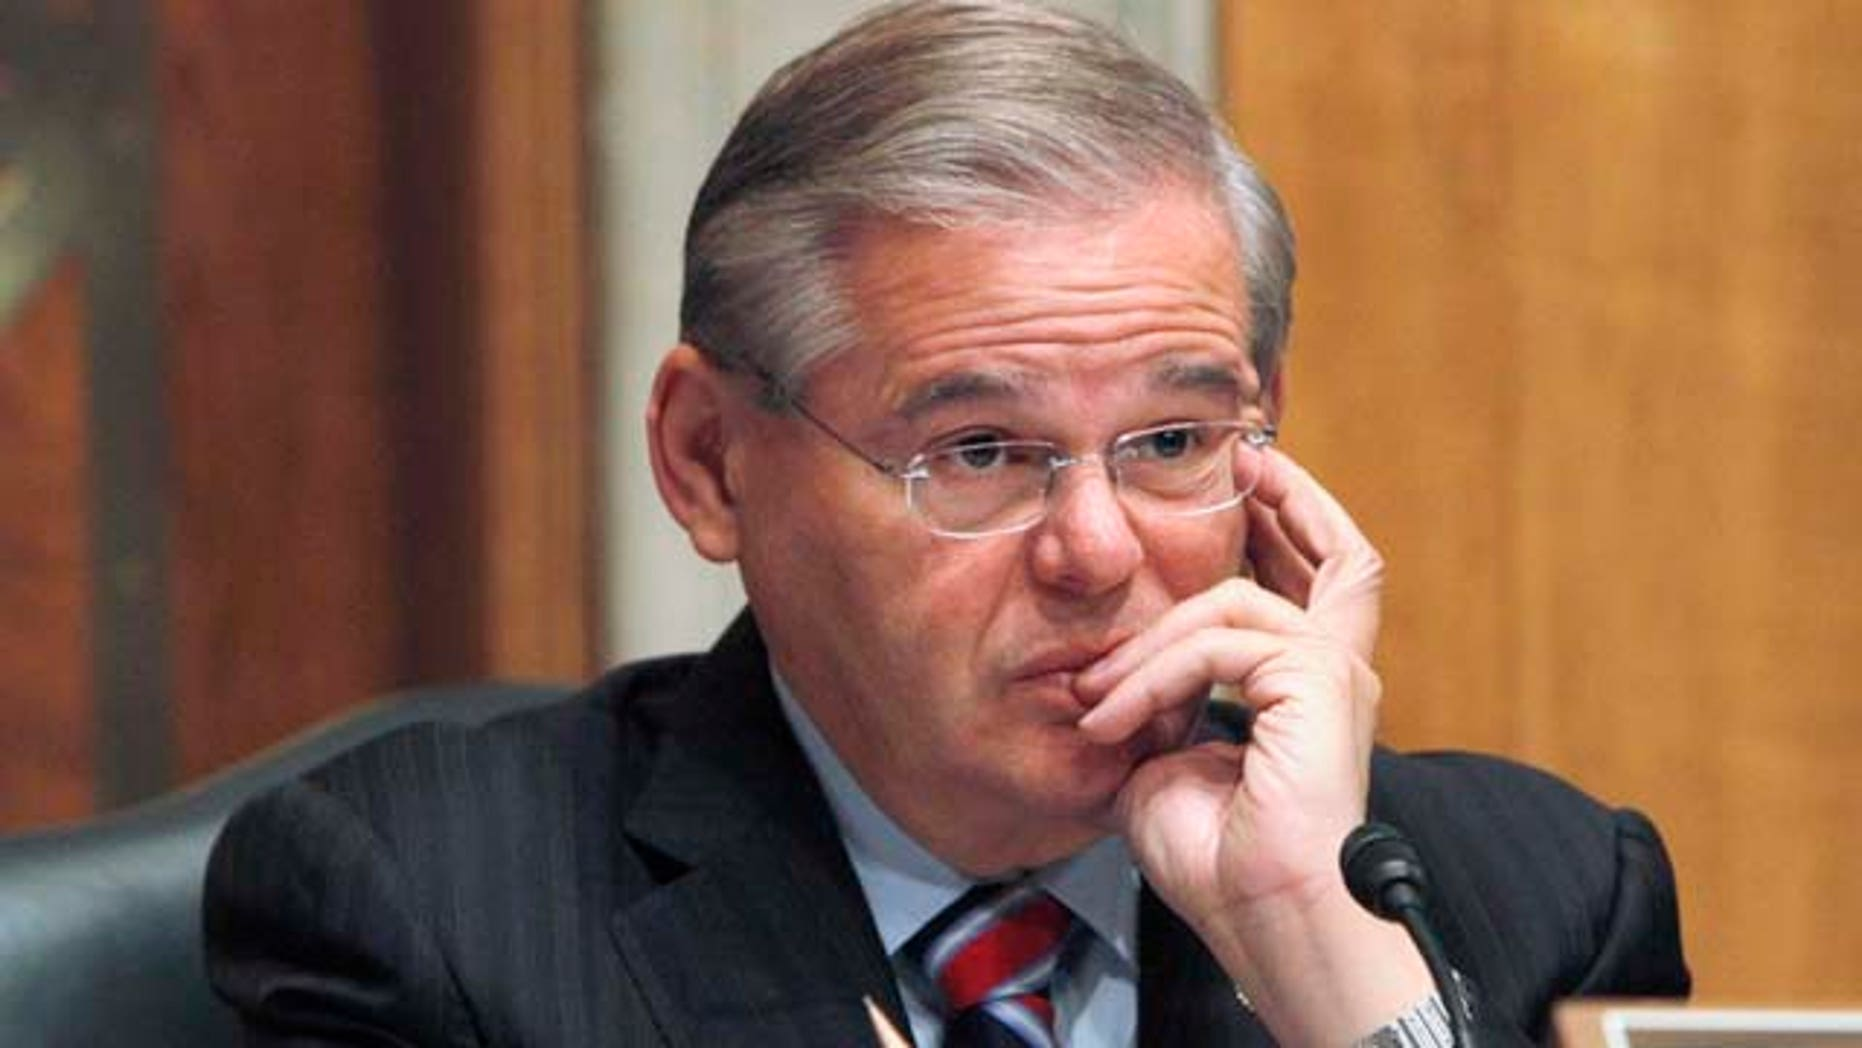 Sen. Robert Menendez, New Jersey Democrat